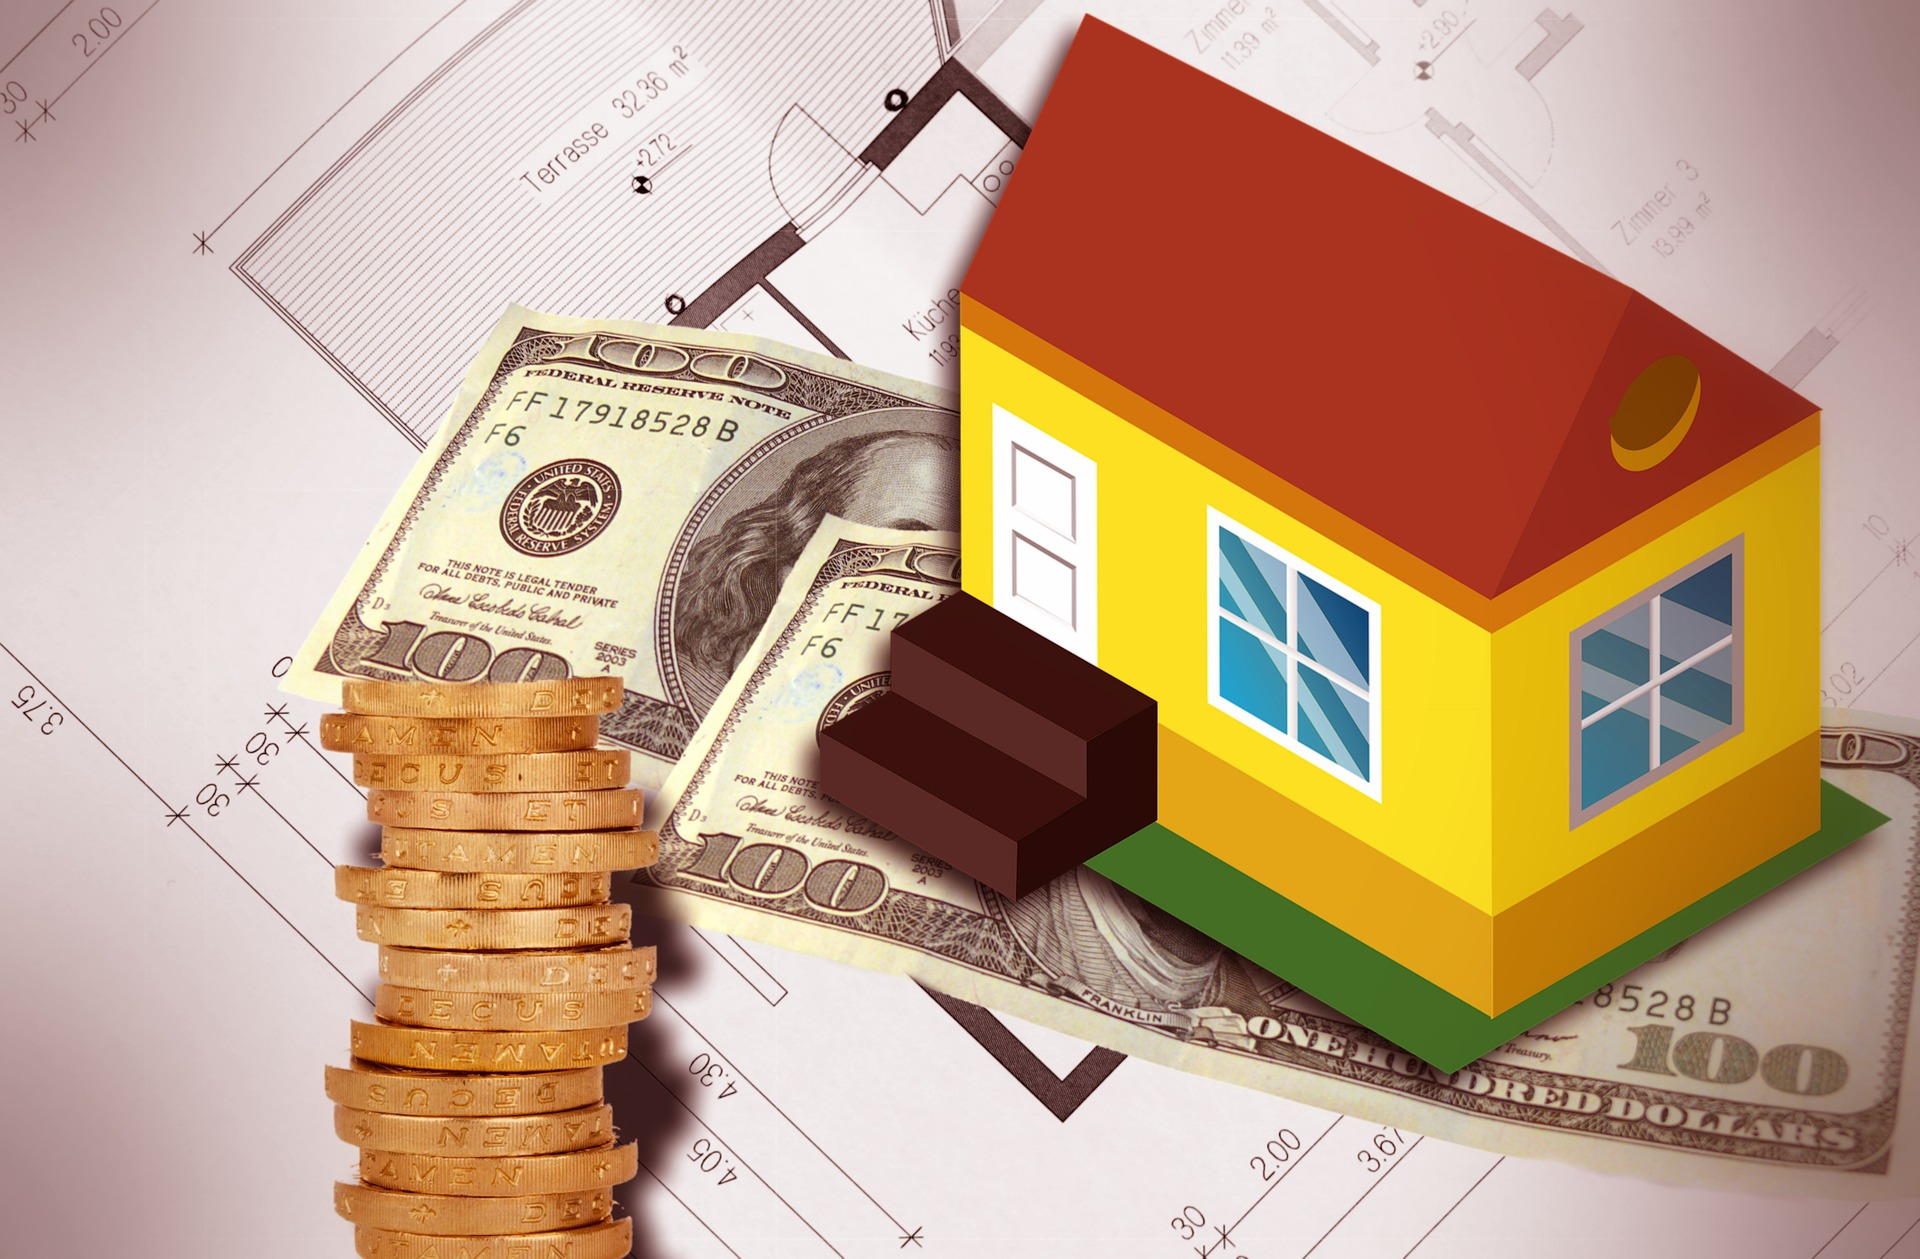 Baltimore City Expanding Eviction Prevention Program